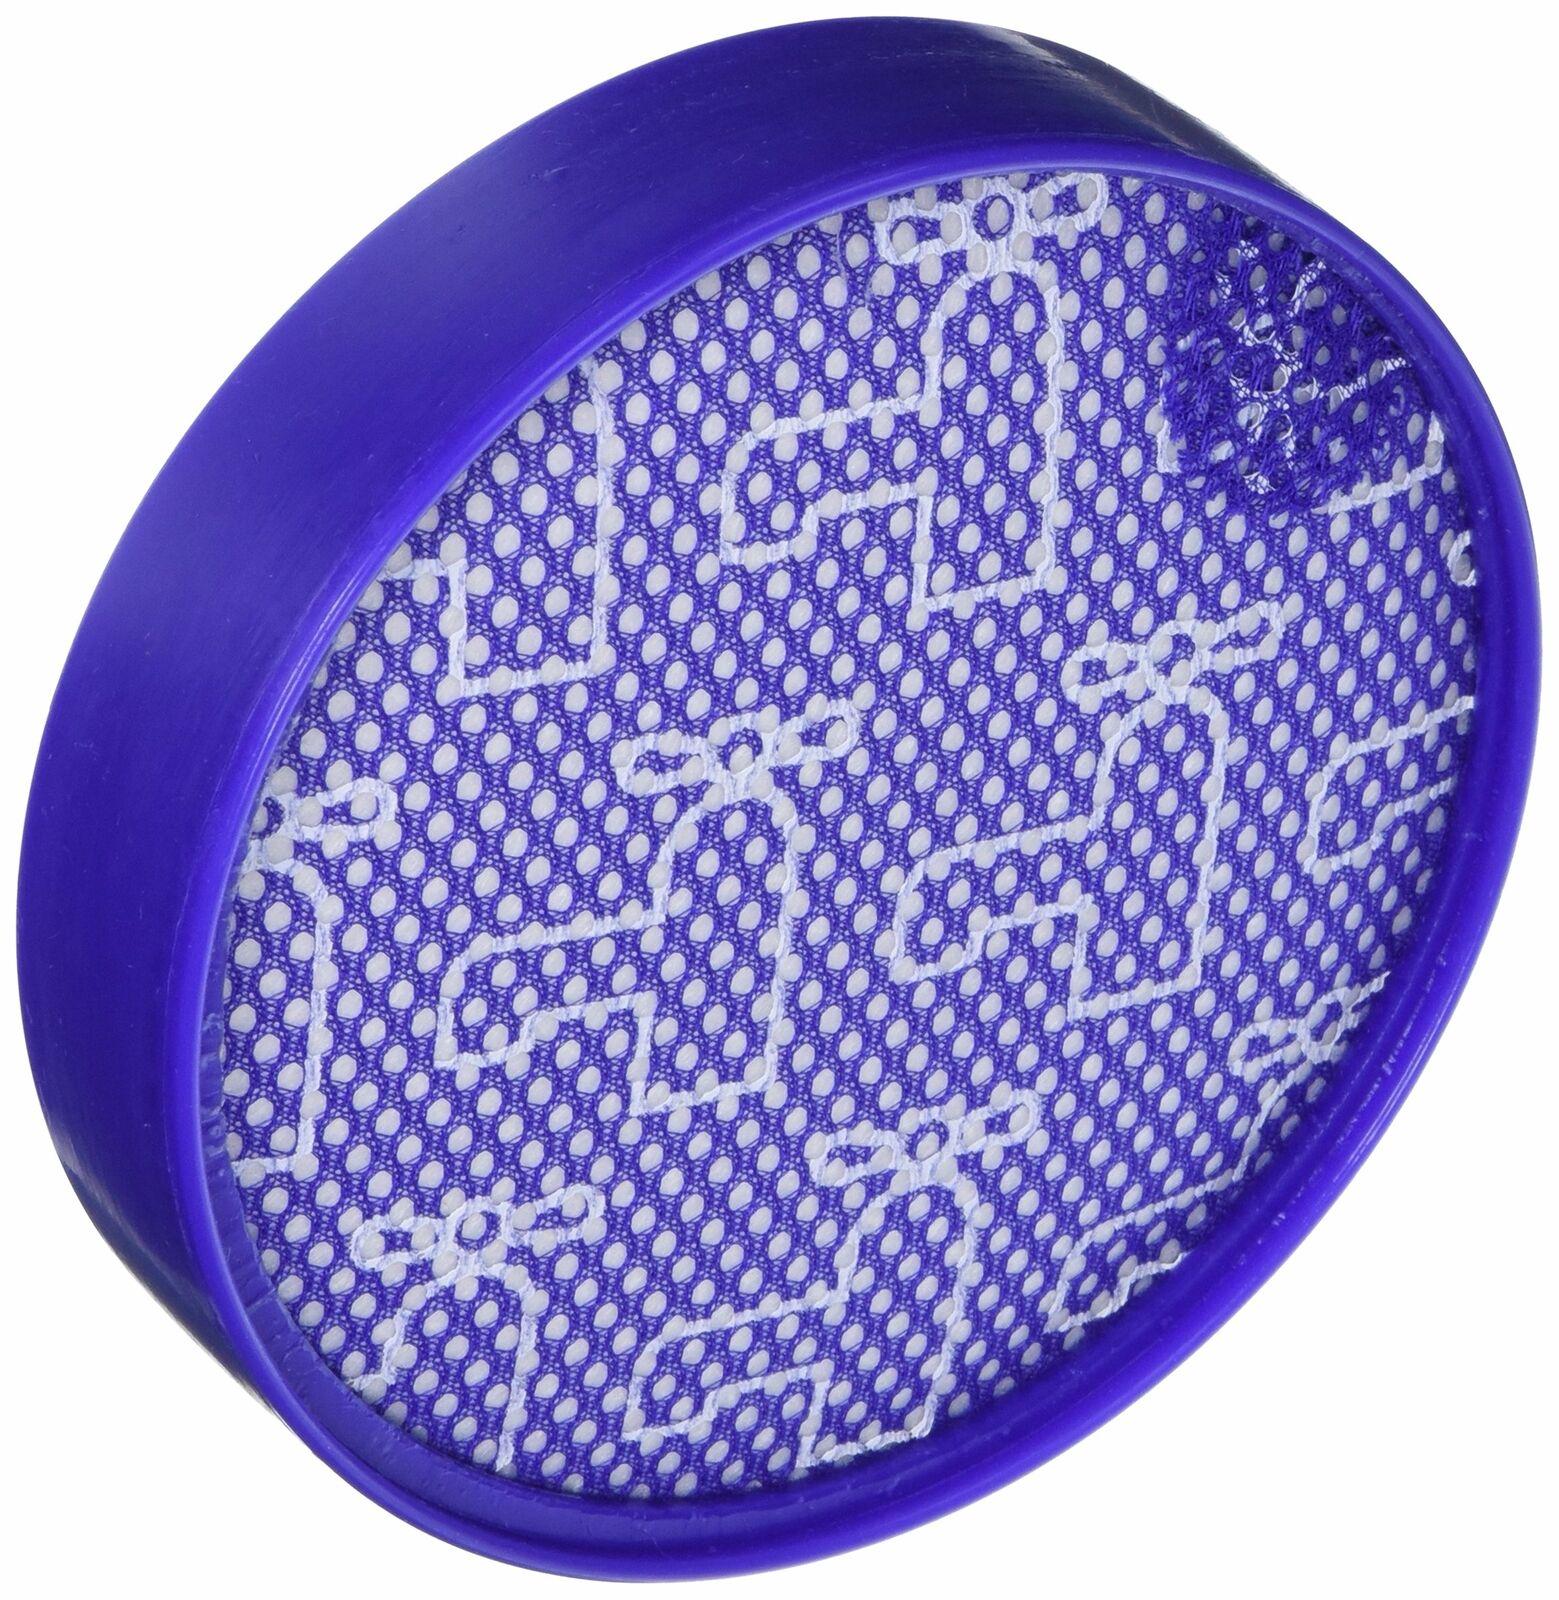 Dyson dc25 ball filter airblade ab03 dyson